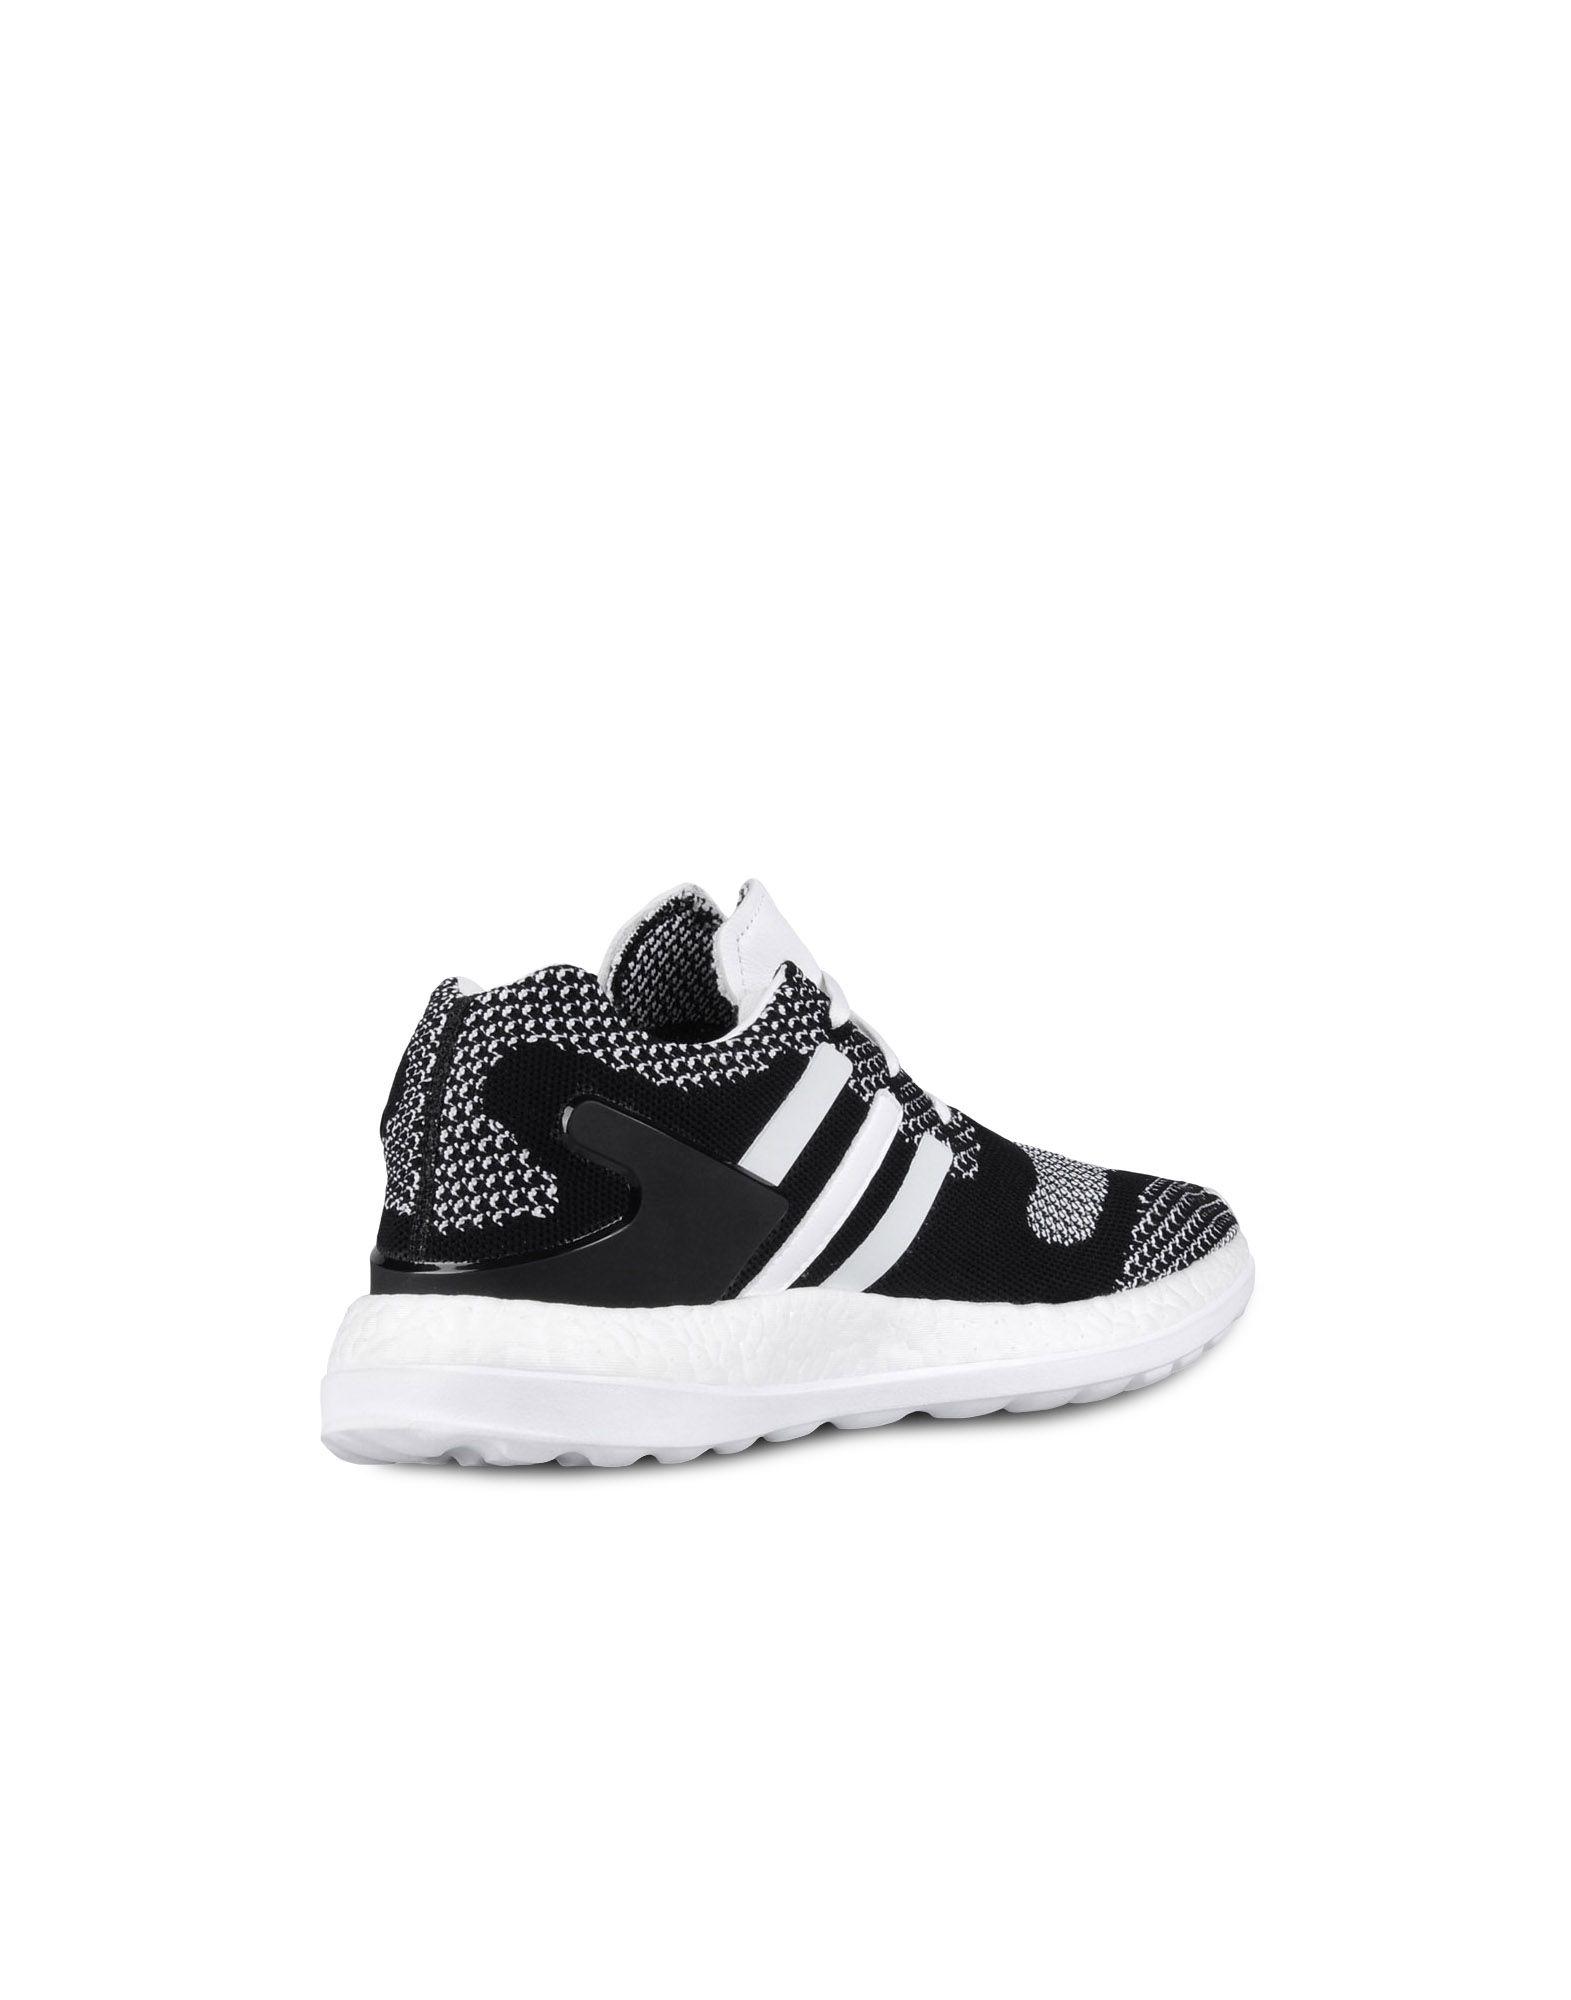 ... australia y 3 pure boost zg knit shoes man y 3 adidas 79be3 e2118 57174b4c3